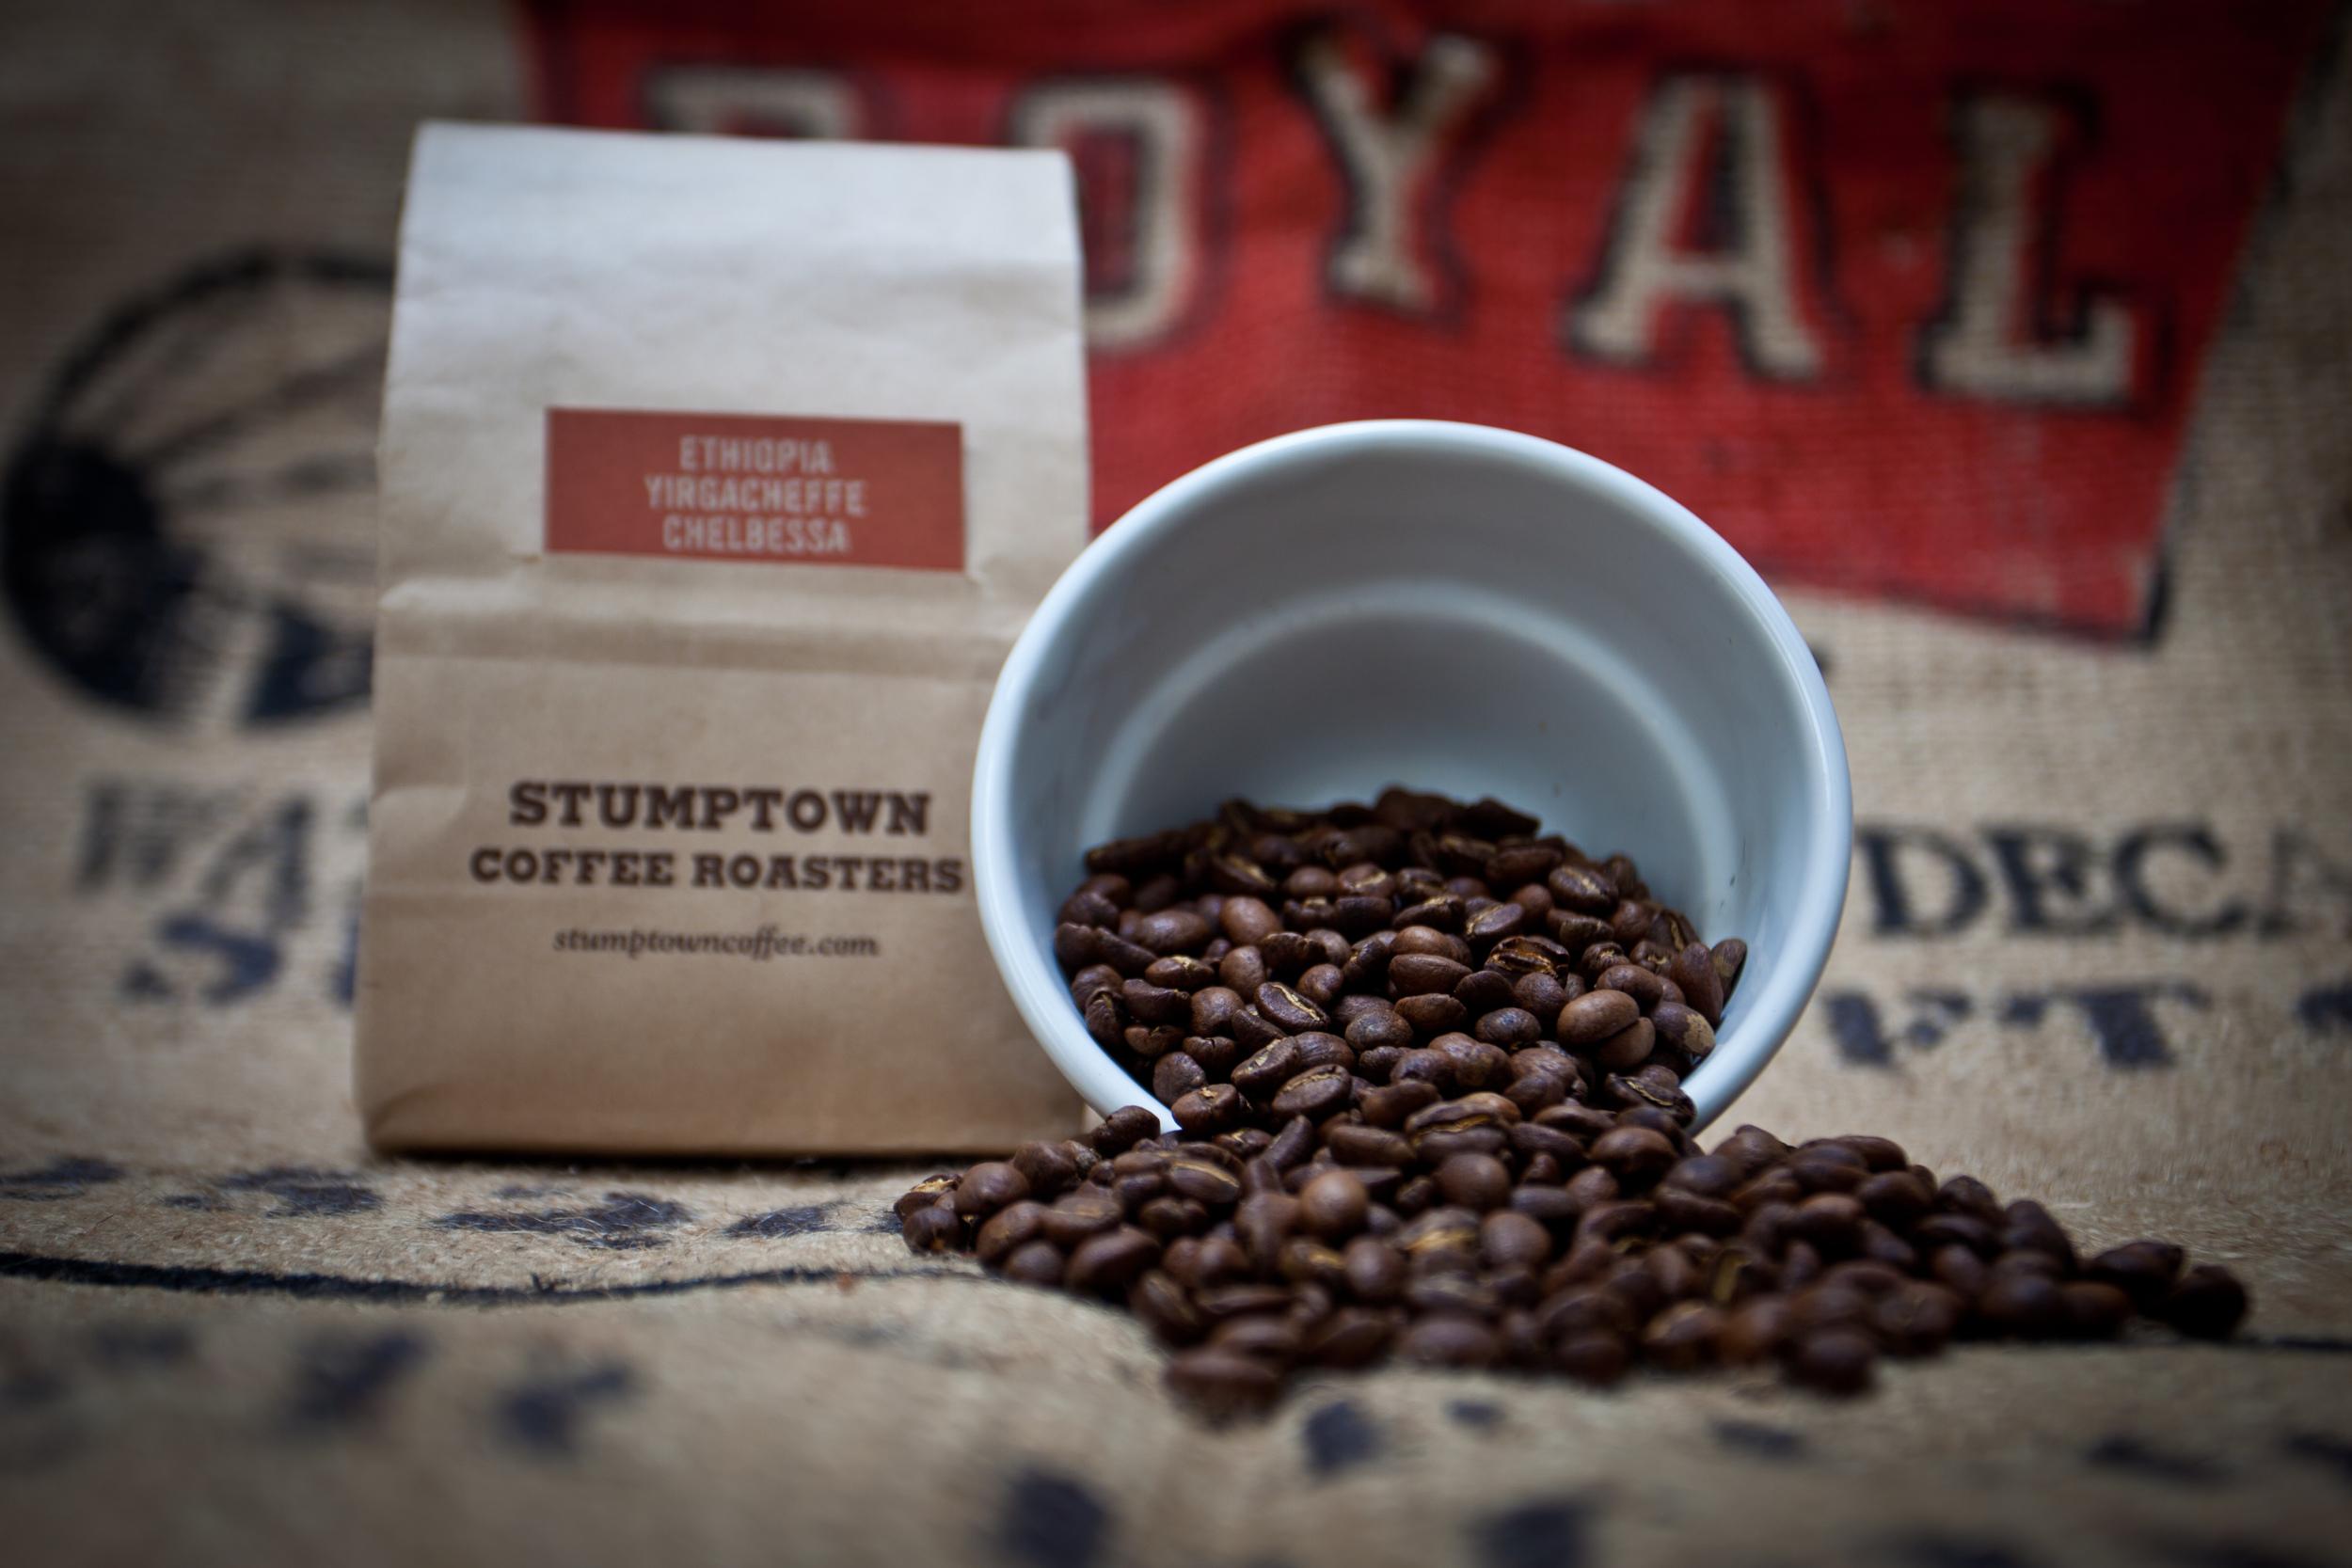 Stumptown Coffee, Stumptown Office Coffee, Ethiopia Chelbessa